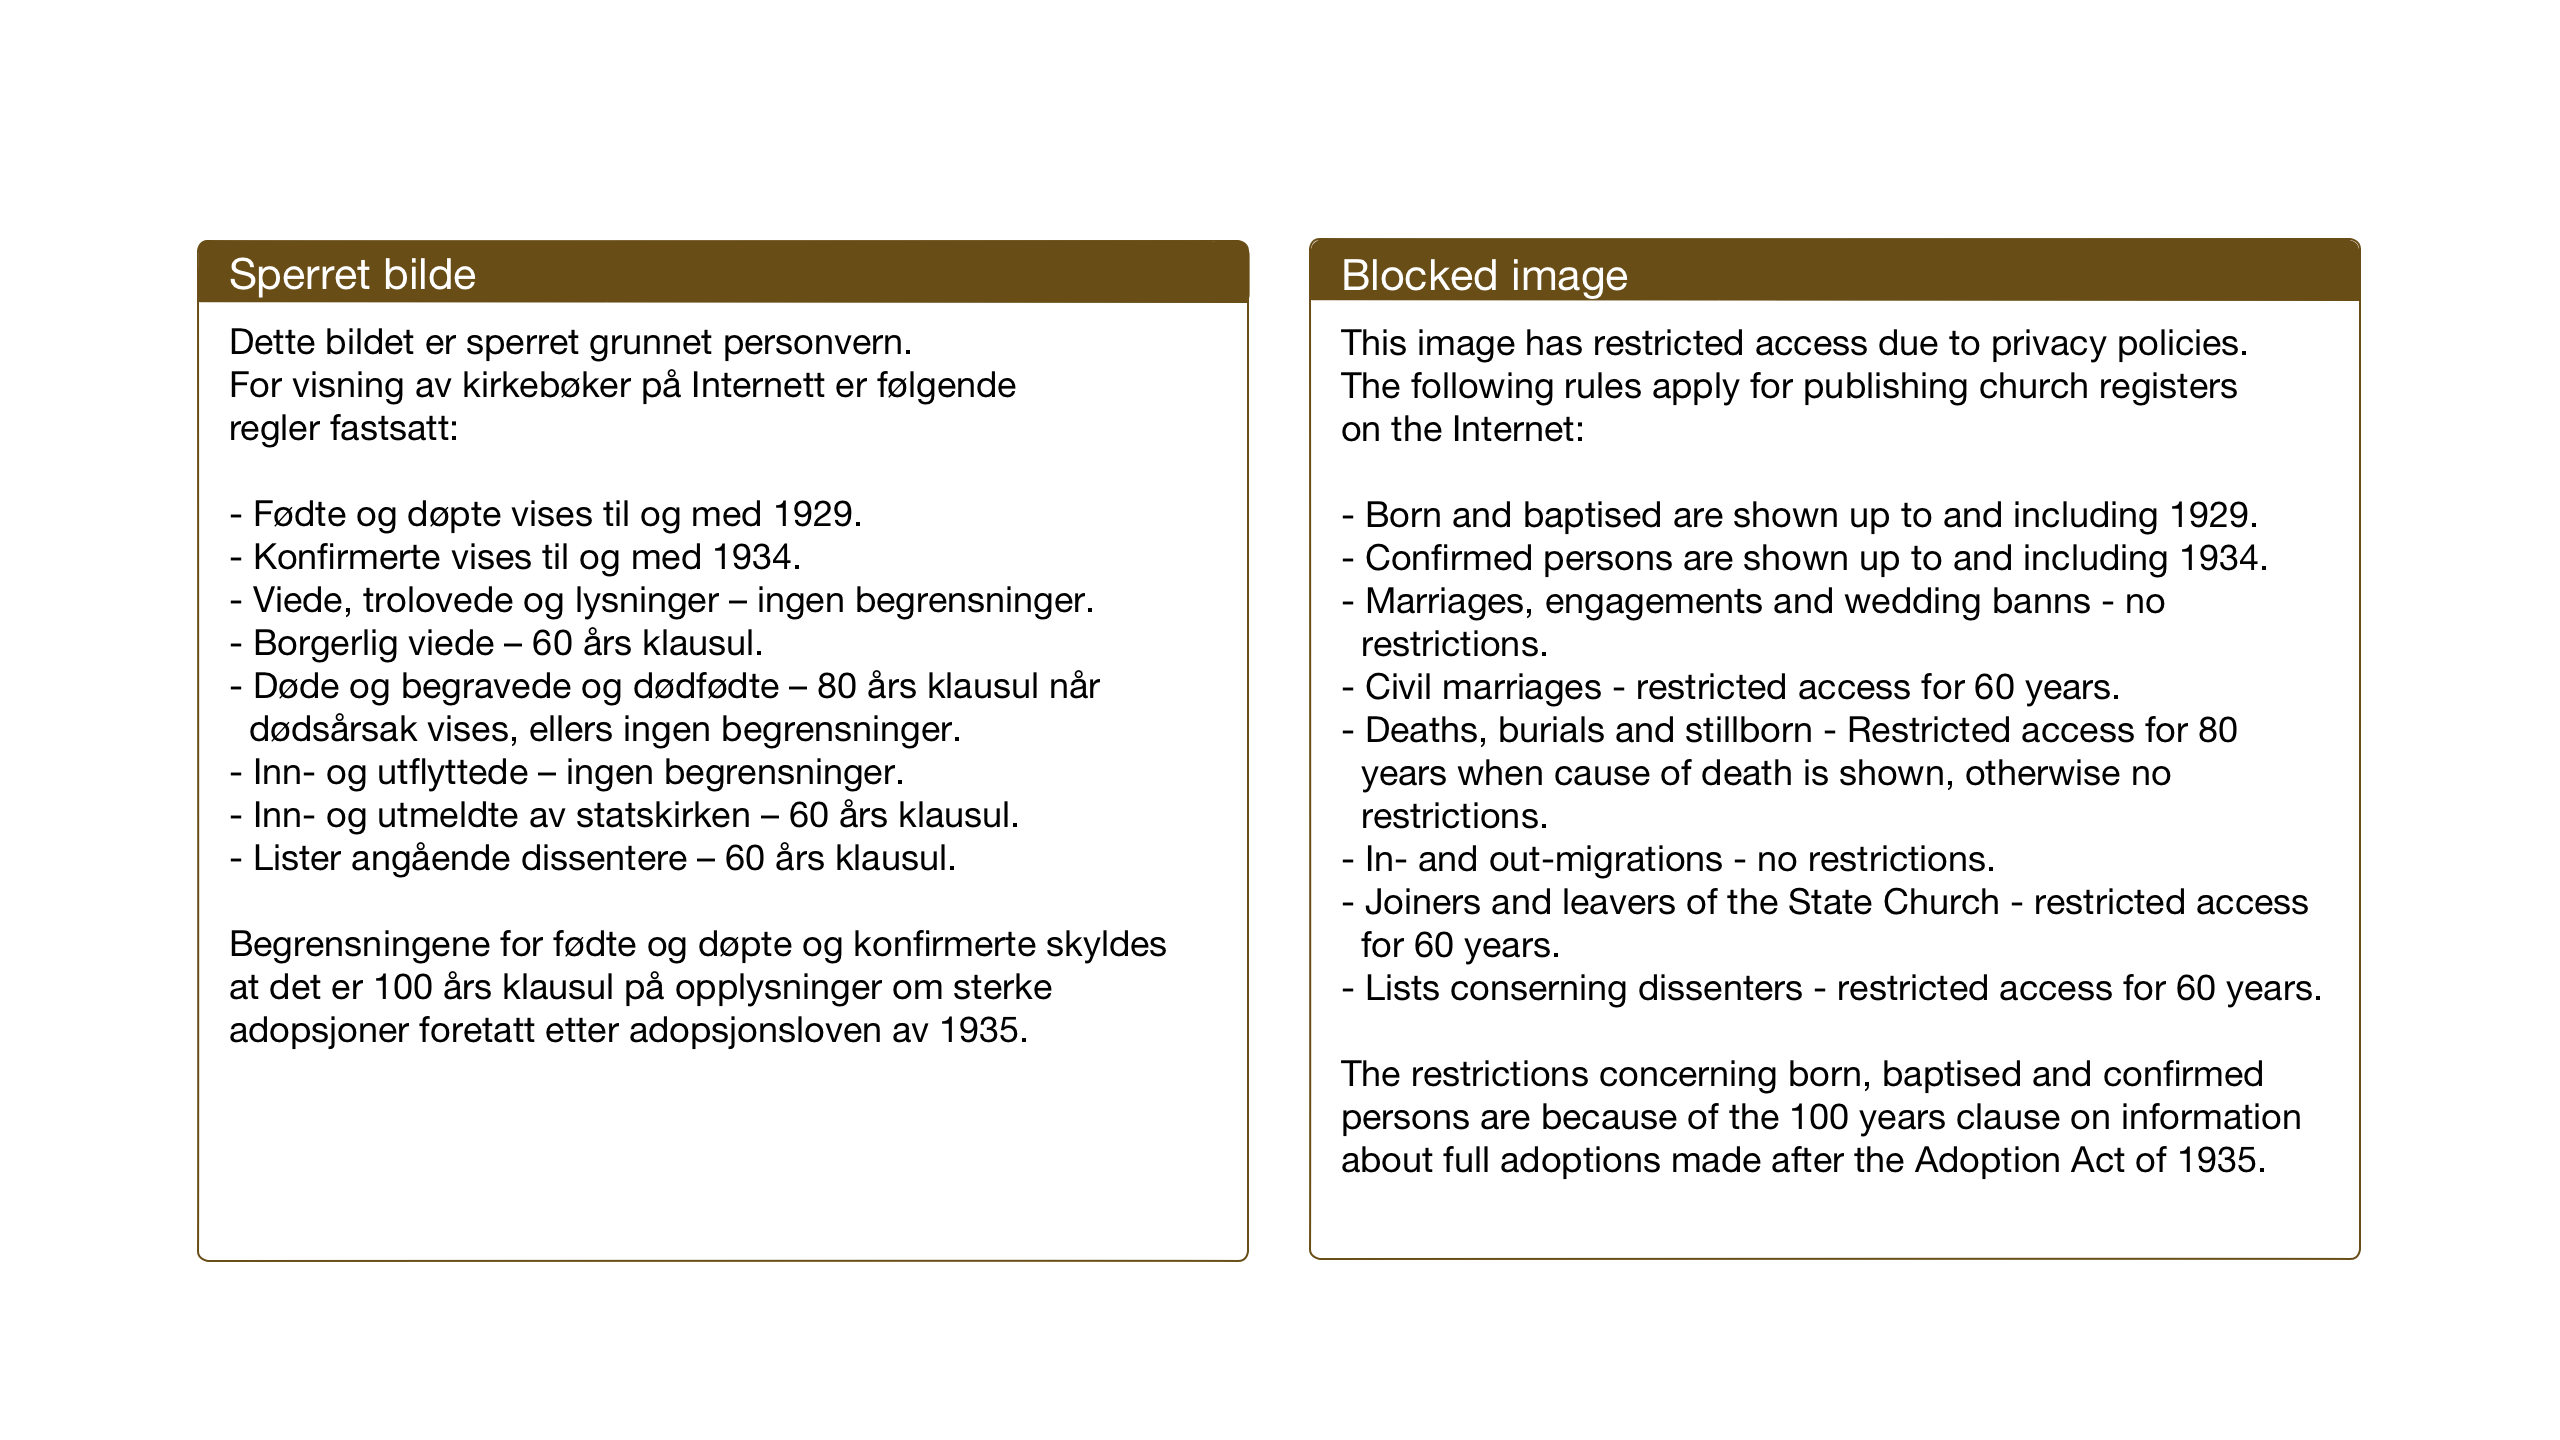 SAT, Ministerialprotokoller, klokkerbøker og fødselsregistre - Sør-Trøndelag, 602/L0151: Parish register (copy) no. 602C19, 1925-1951, p. 93